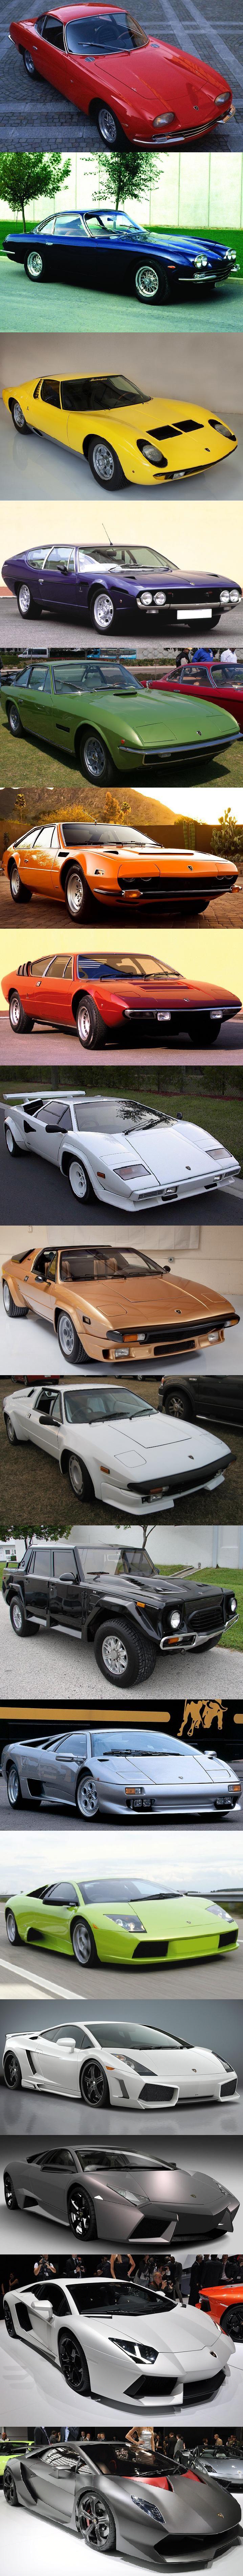 Chronology Of Lamborghini Prodution (not including concept vehicles) From Top to Bottom:   350 GT;  400 GT 2+2;  Miura;  Espada;  Islero;  Jarama;  Urraco;  Countach;  Silhouette;  Jalpa;  LM002;  Diablo;  Murciélago;  Gallardo;  Reventón;  Aventador;  Sesto Elemento. https://www.amazon.co.uk/Baby-Car-Mirror-Shatterproof-Installation/dp/B06XHG6SSY/ref=sr_1_2?ie=UTF8&qid=1499074433&sr=8-2&keywords=Kingseye